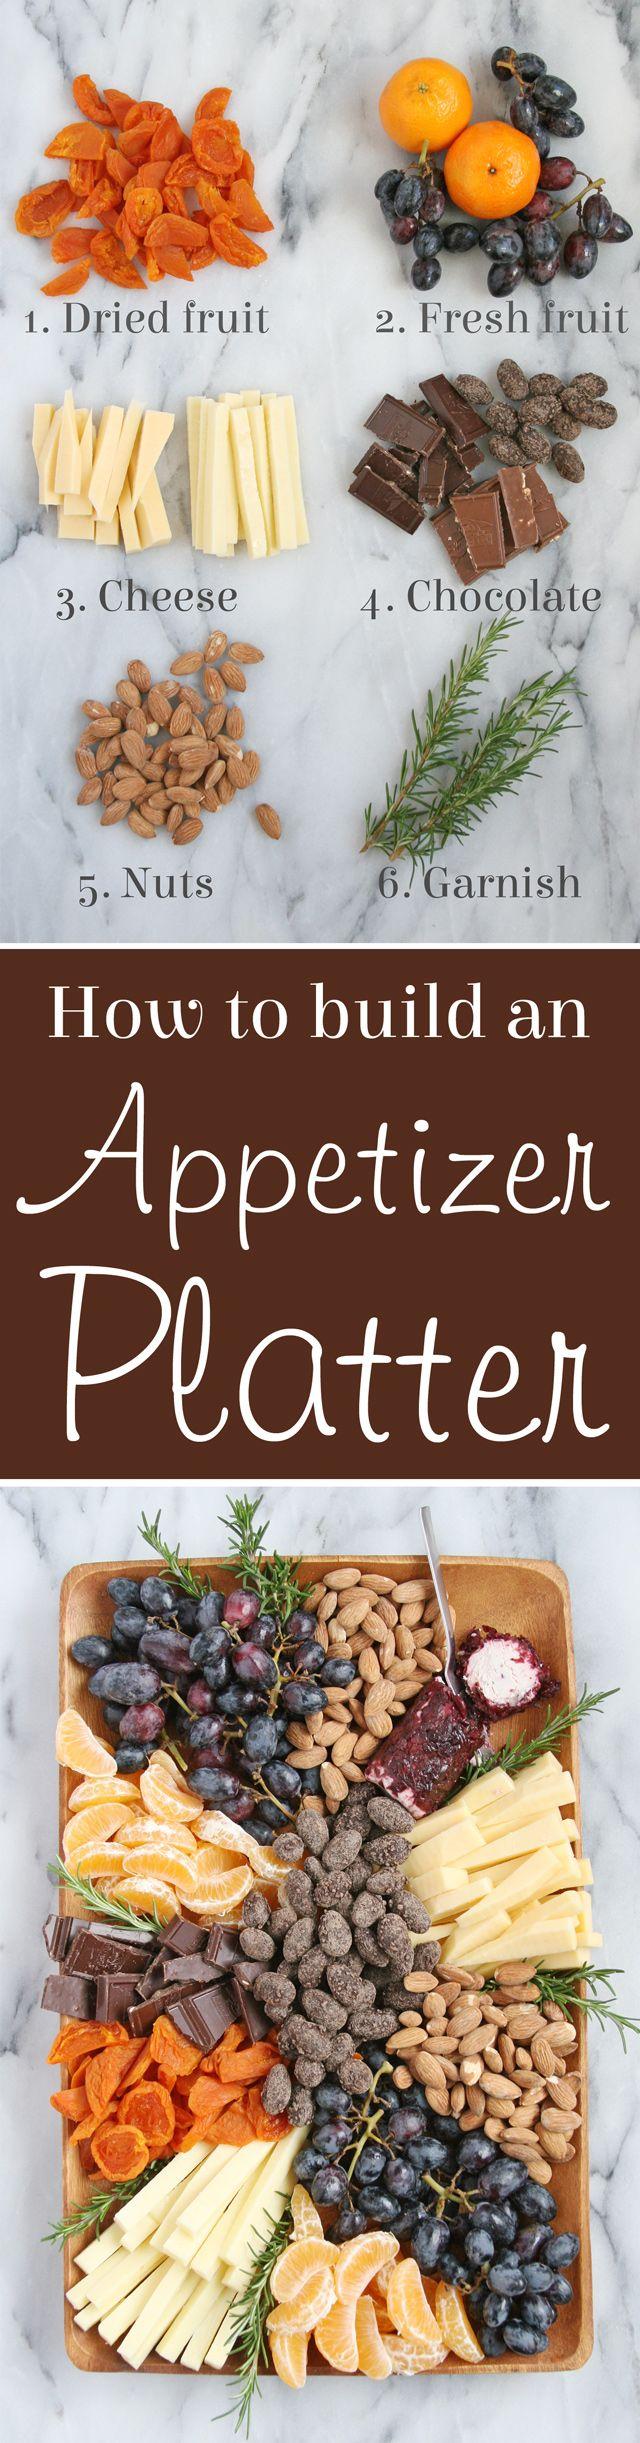 How to build a Gourmet Appetizer Platter!